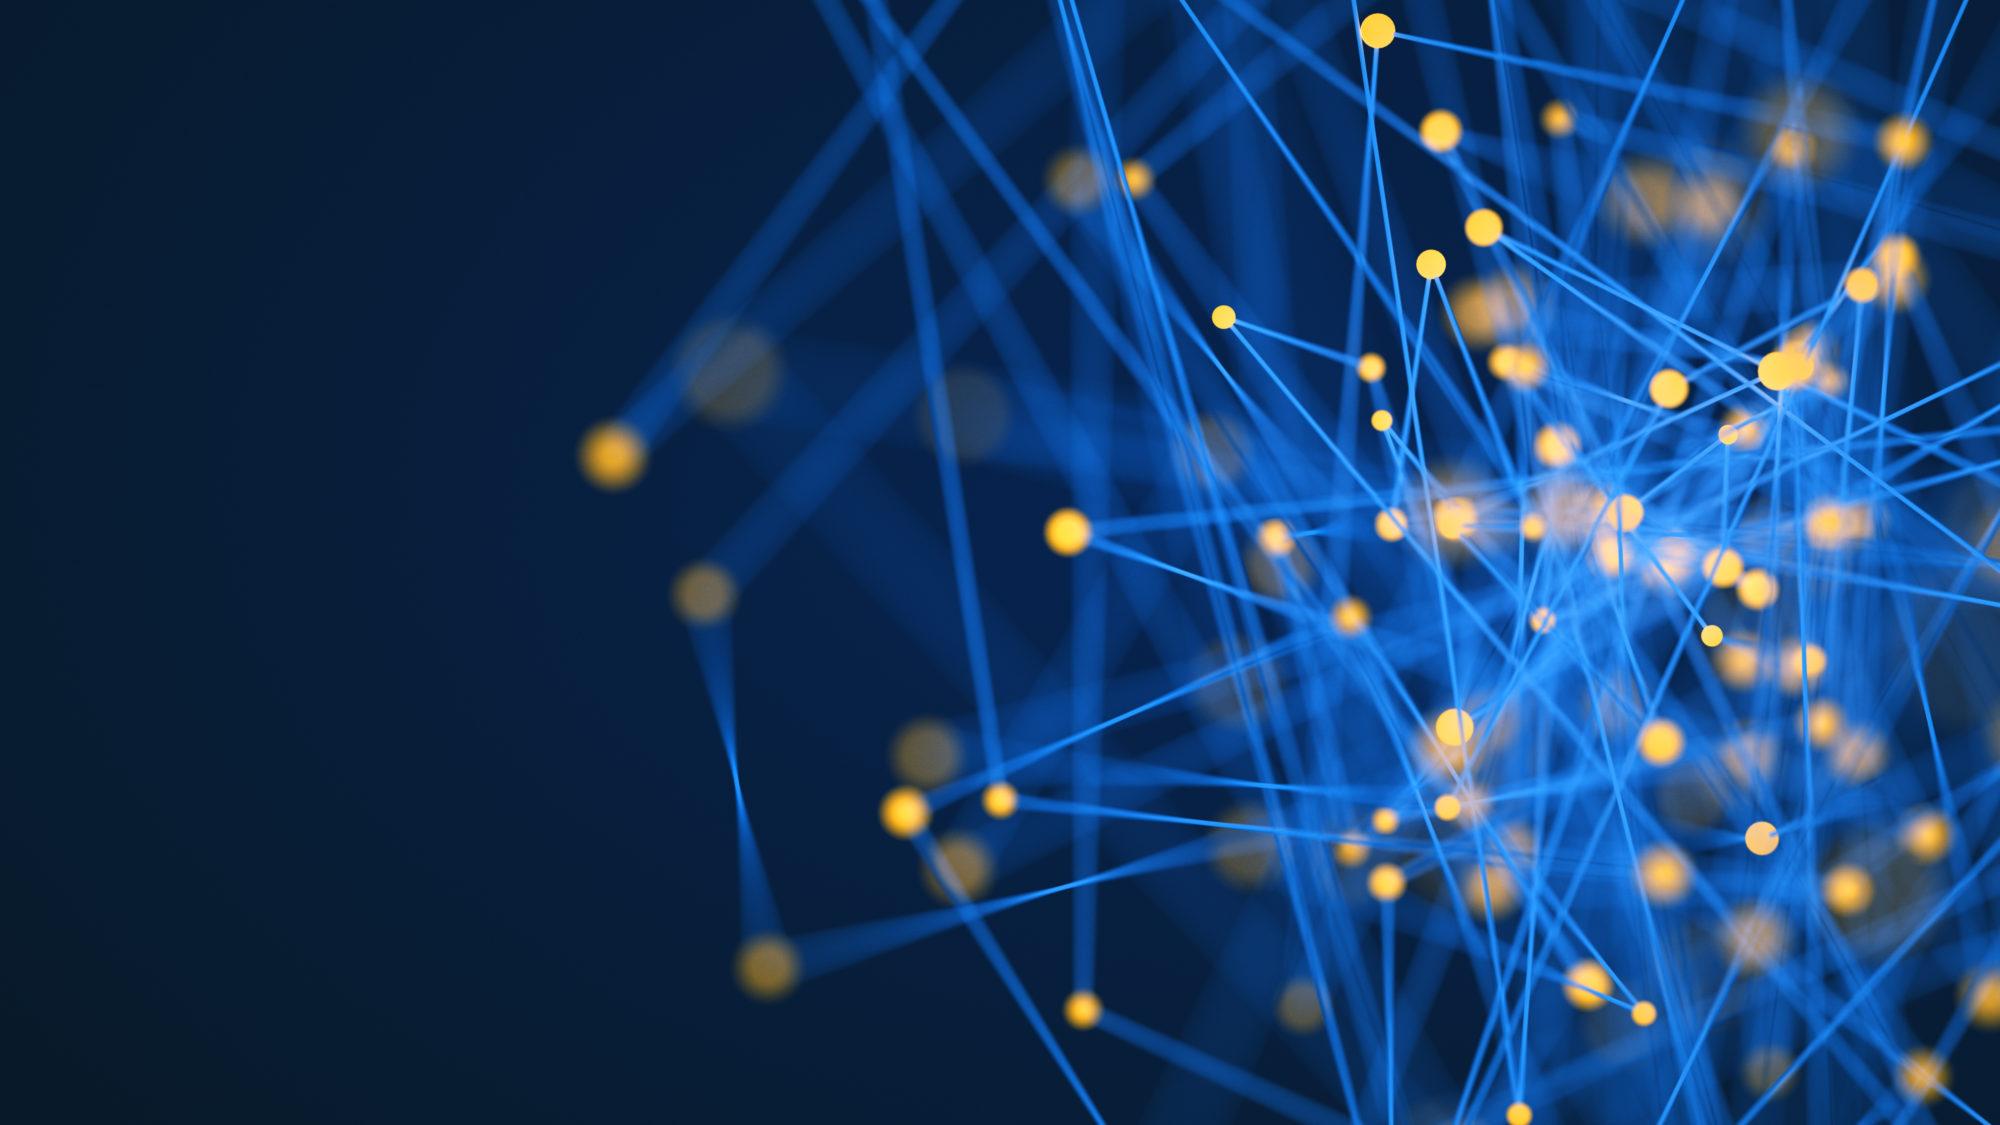 A spectrum of the global digital network integration